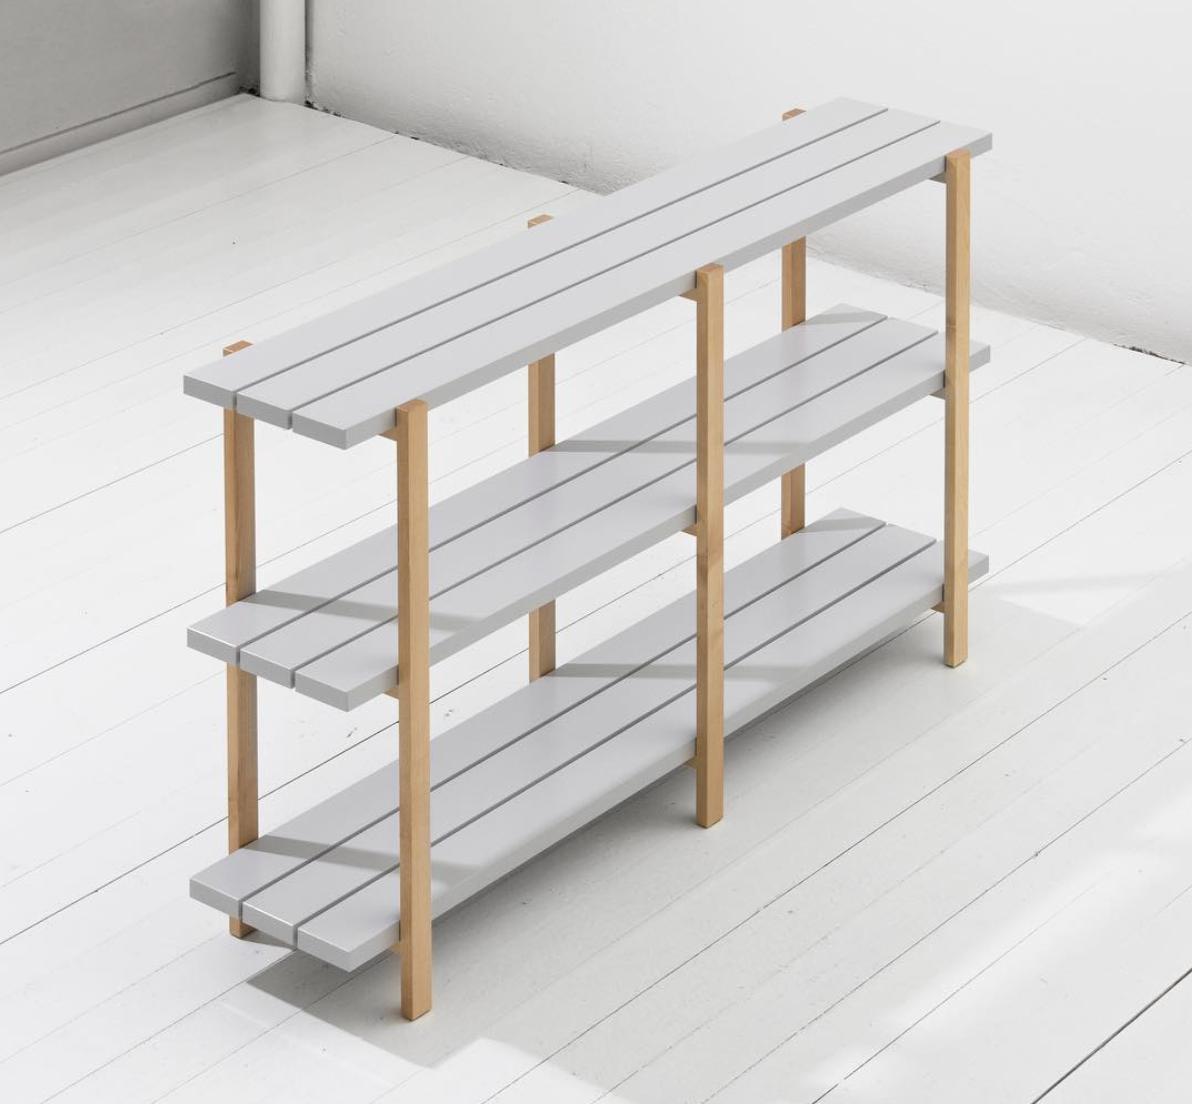 Shelving unit Ypperlig by  HAY x IKEA  - Credit photo : Biggamedesign